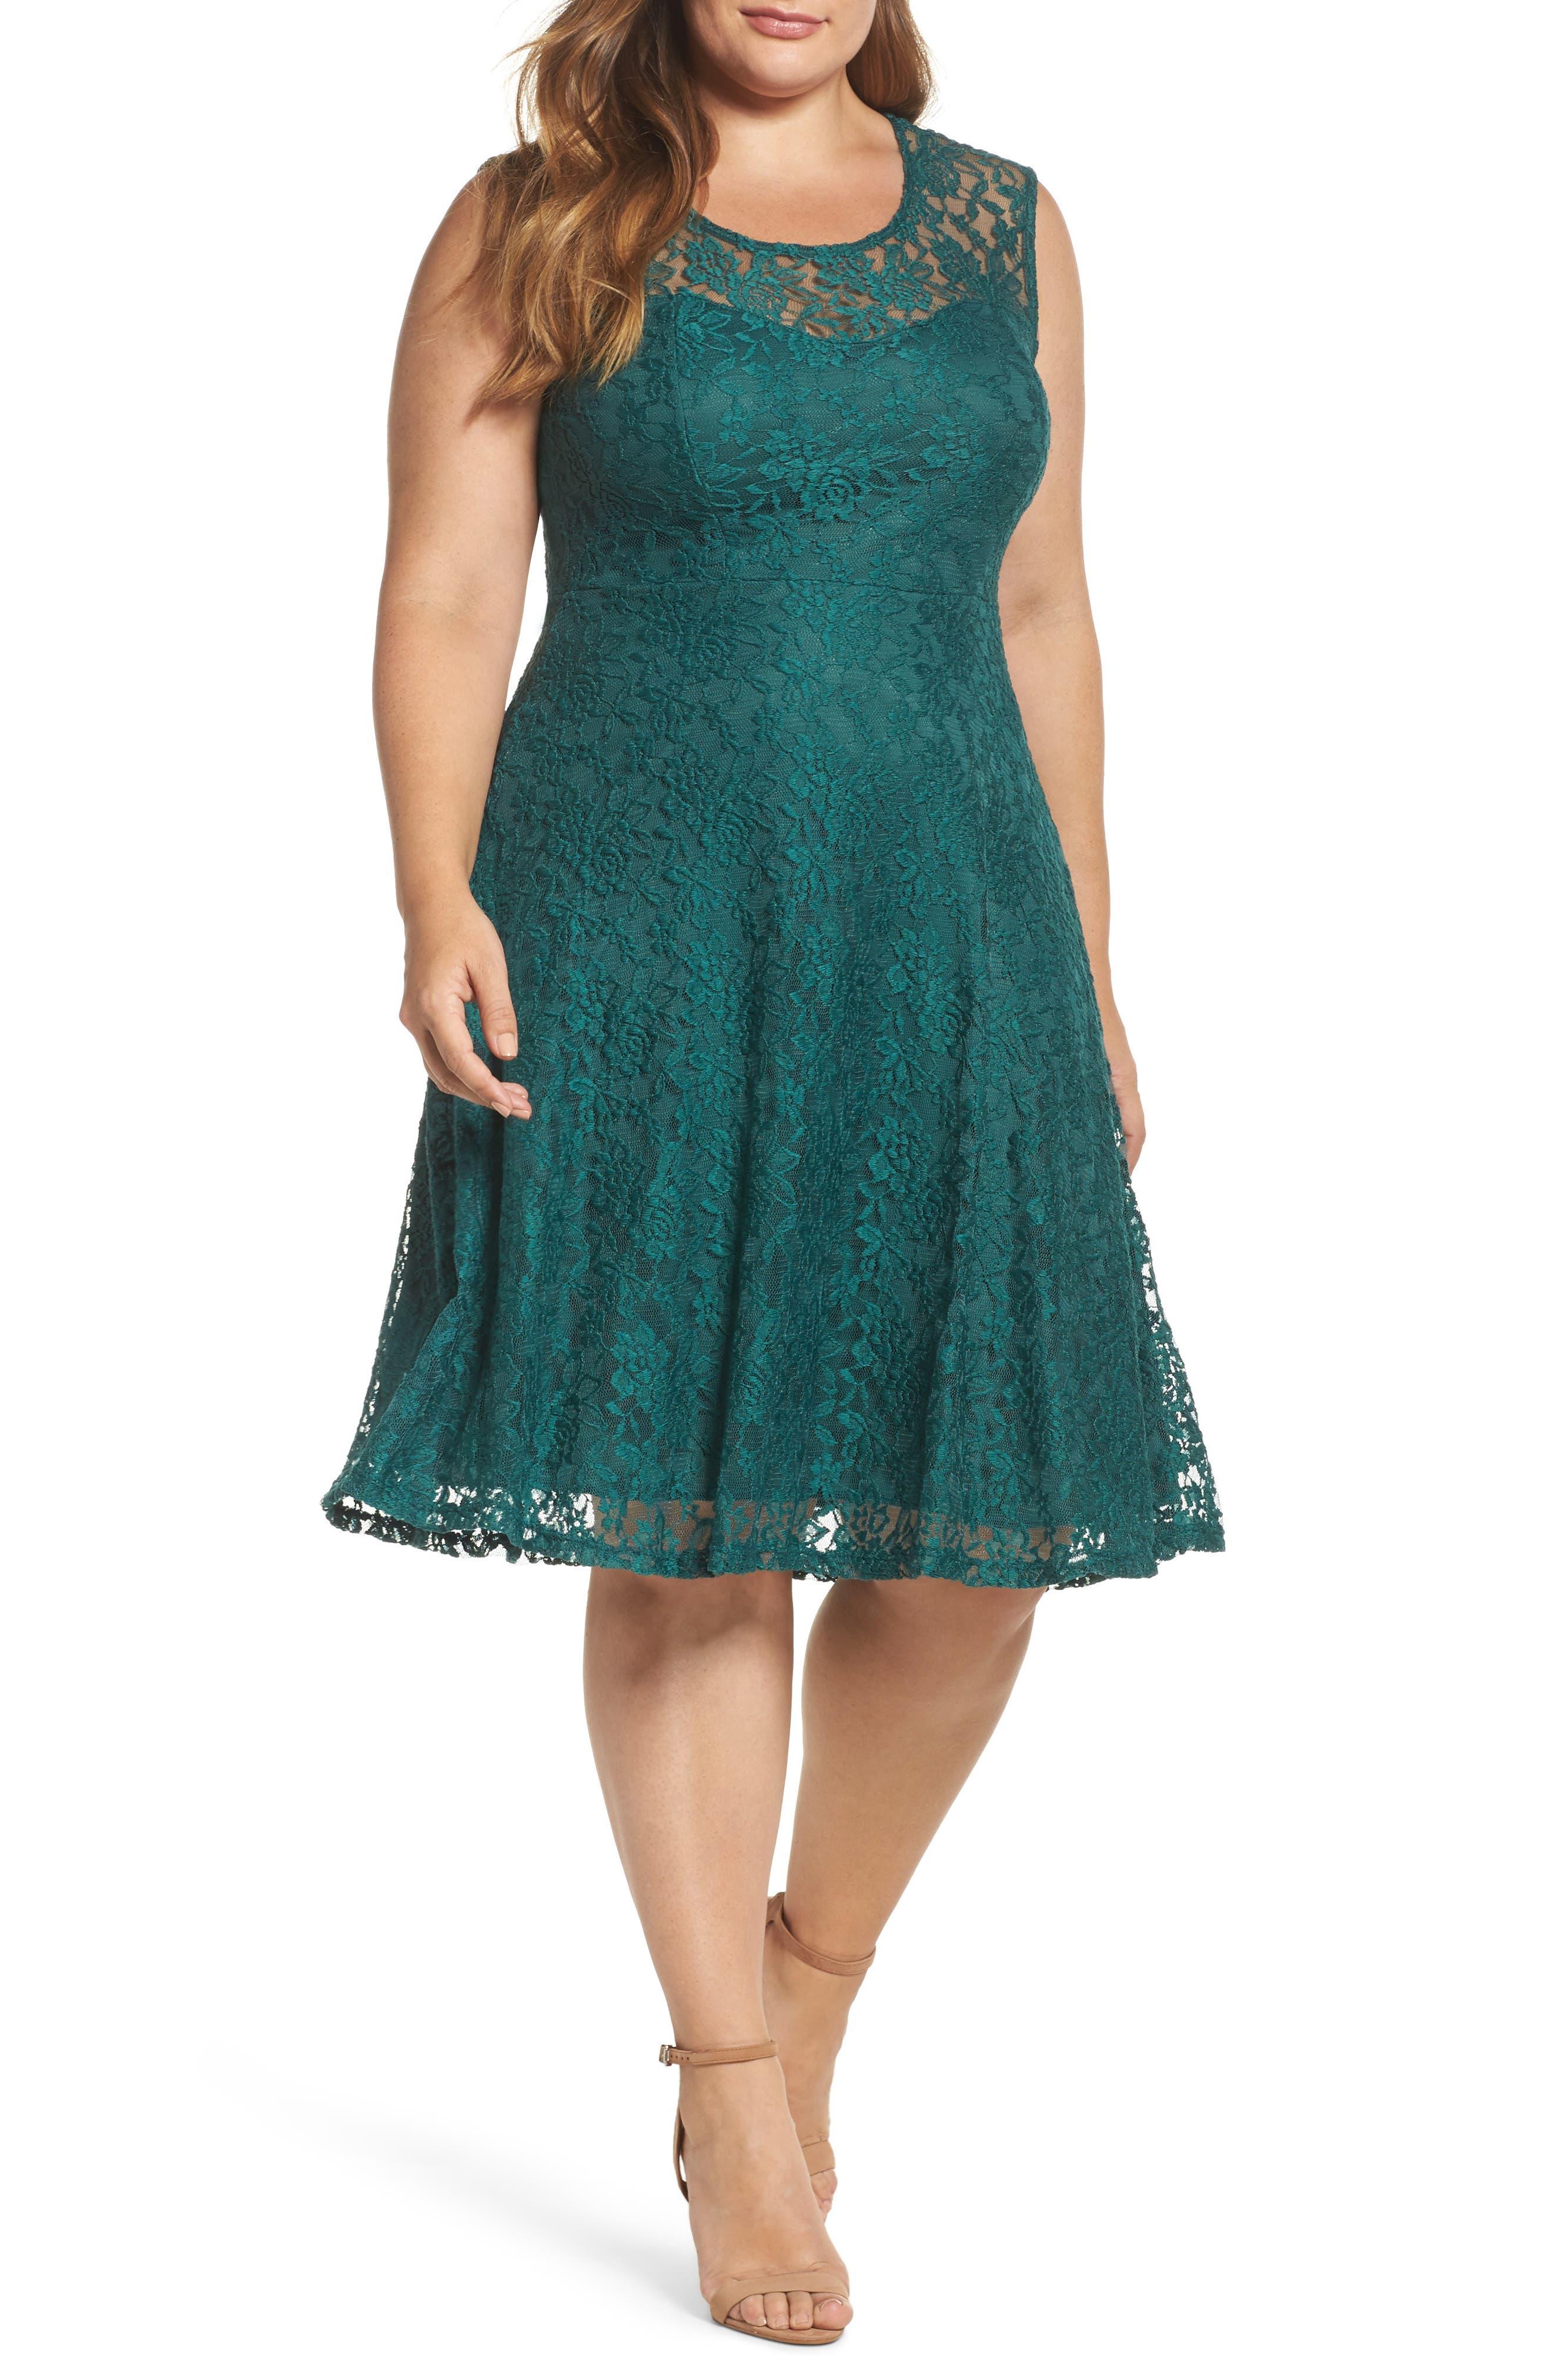 Lace Skater Dress,                             Main thumbnail 1, color,                             363